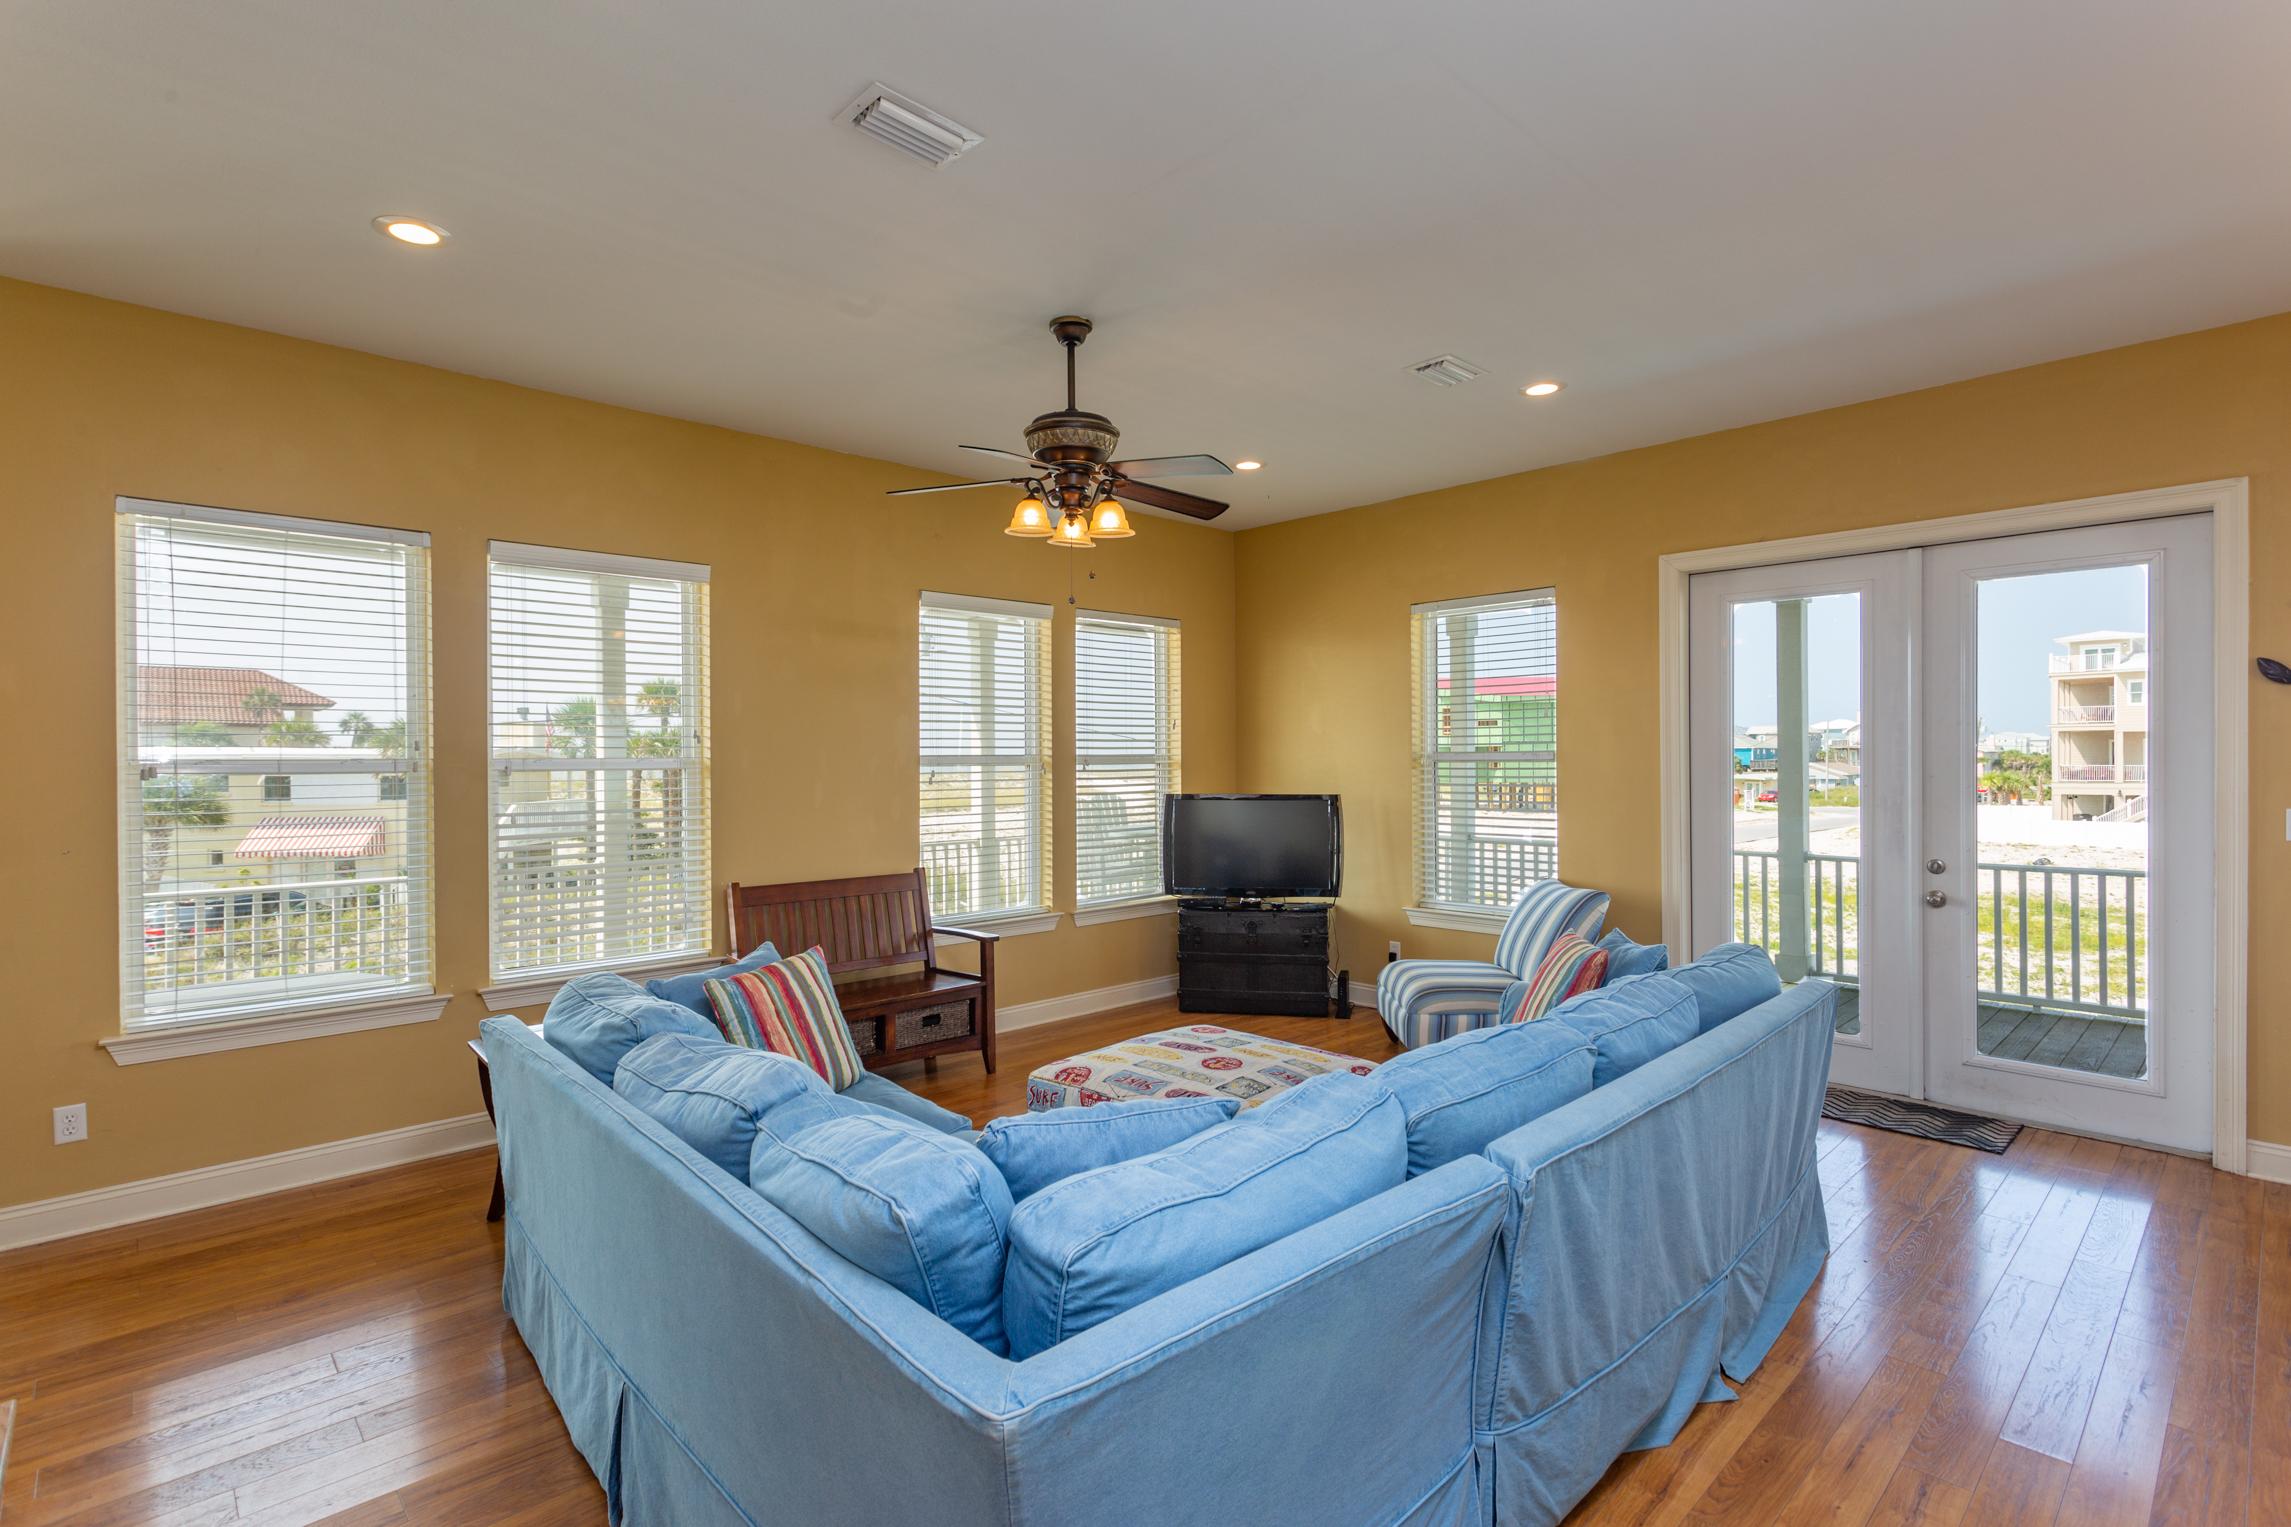 Maldonado 500 House/Cottage rental in Pensacola Beach House Rentals in Pensacola Beach Florida - #7